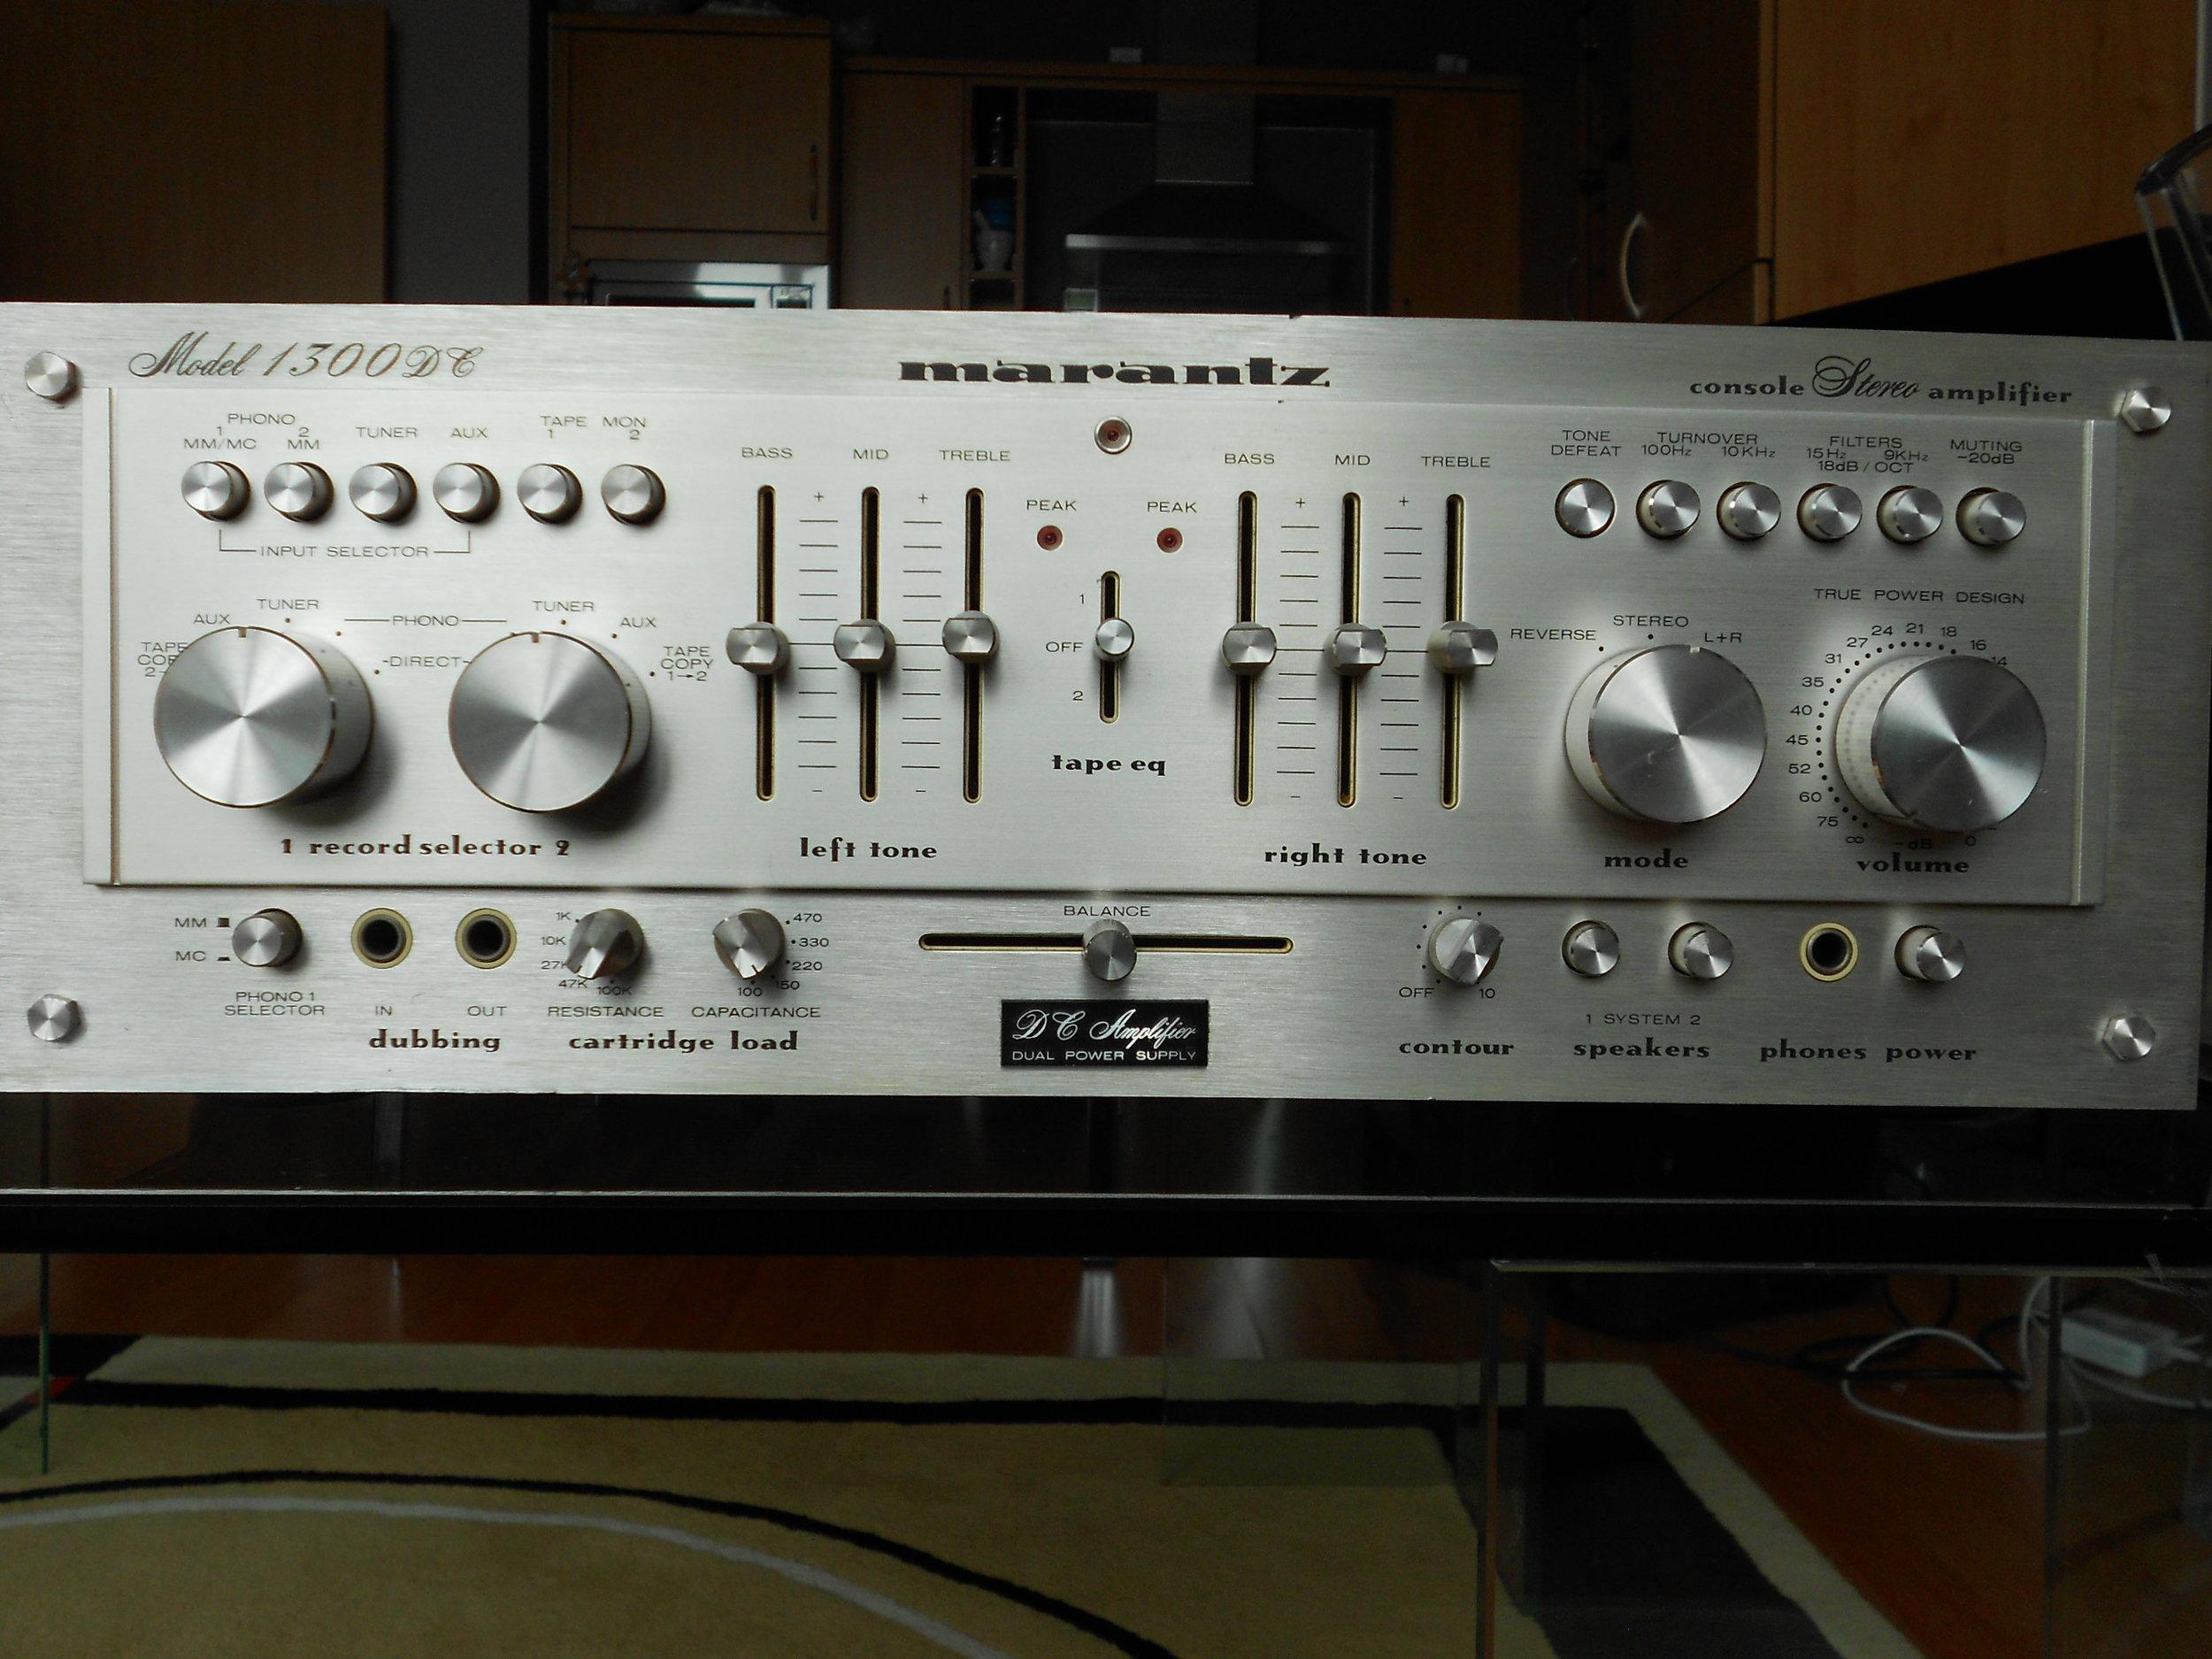 Marantz 1300DC amplifier.